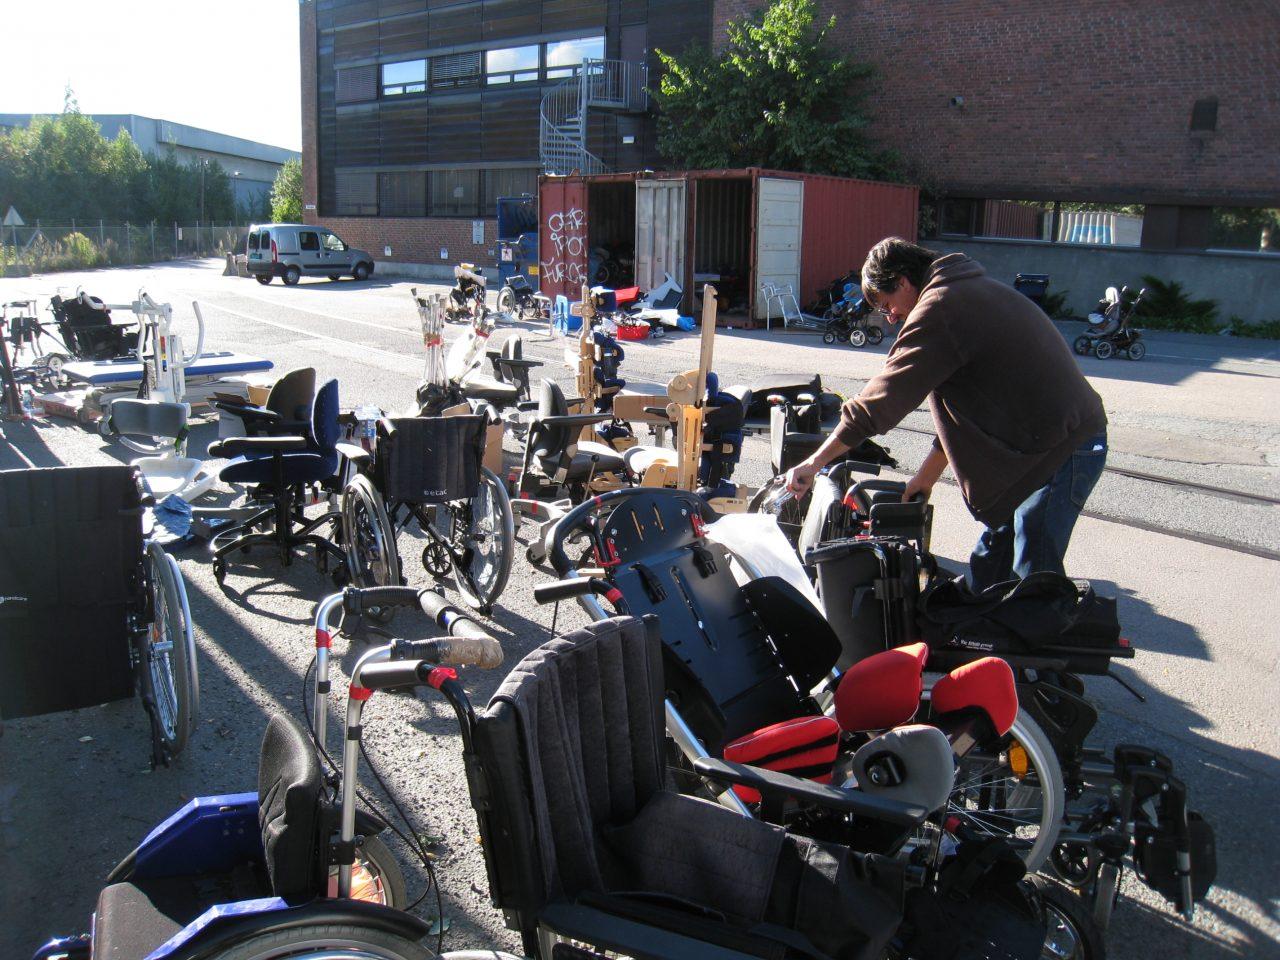 Carlos med utstyr til container nr 59